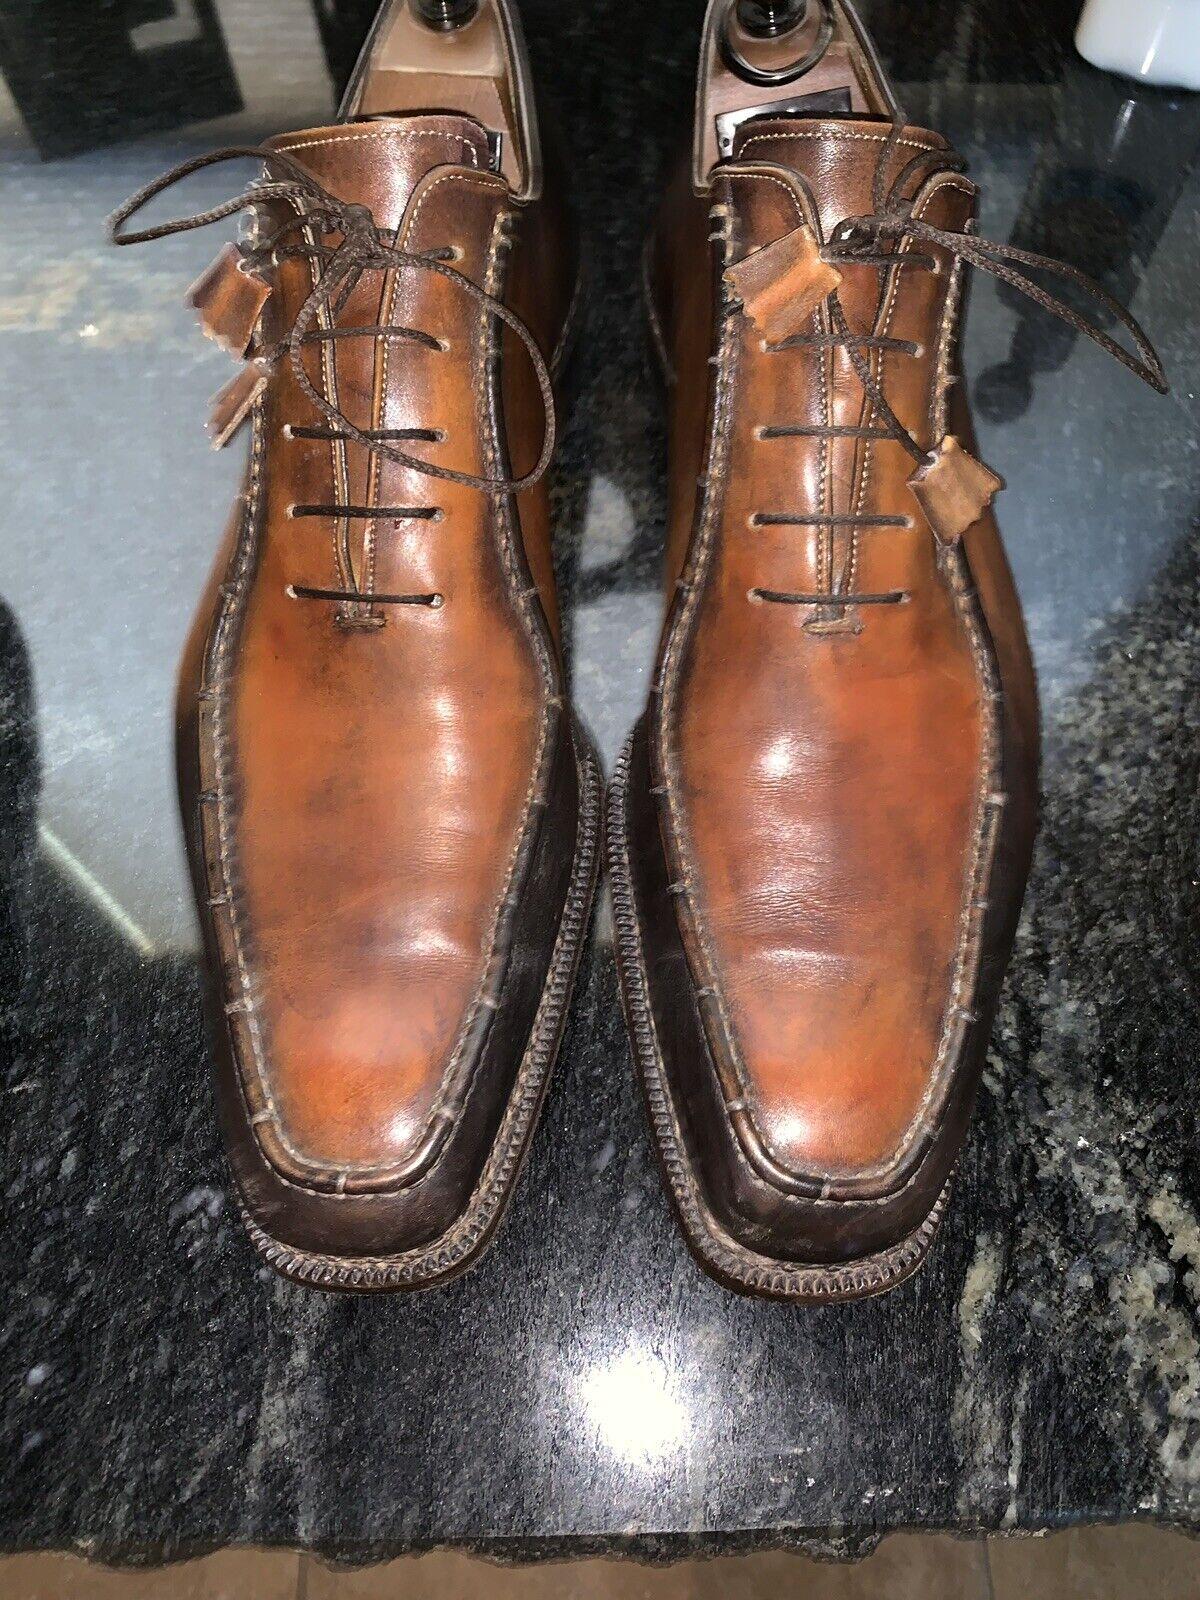 Calzoleria Harris Barney's uomo dress scarpe Dimensione 11 12US Dress Formal